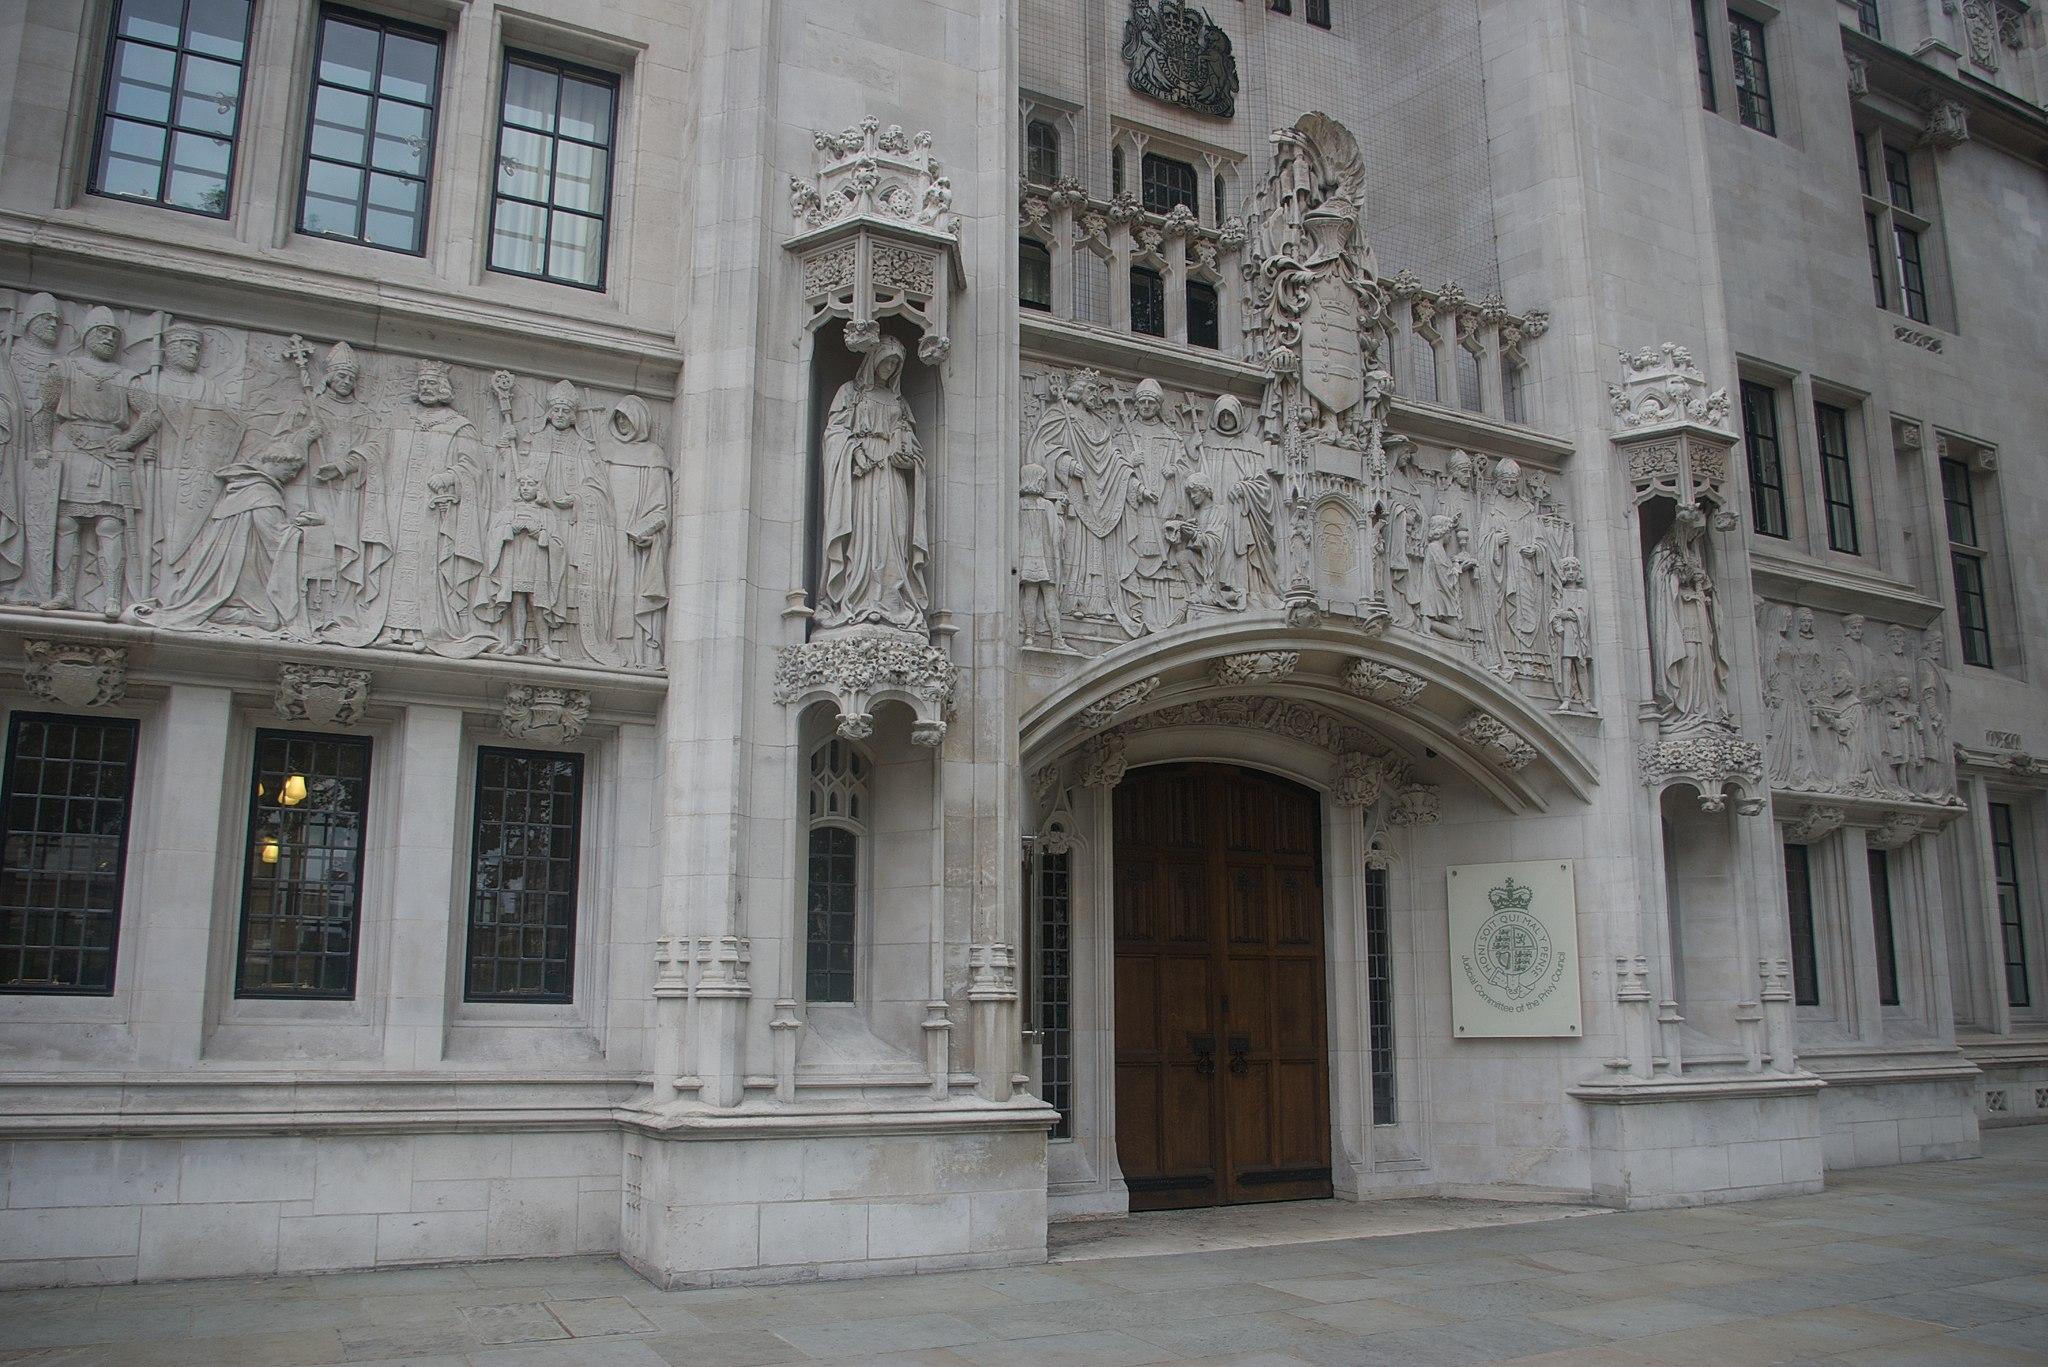 https://commons.wikimedia.org/wiki/File:UK_Supreme_Court.jpg